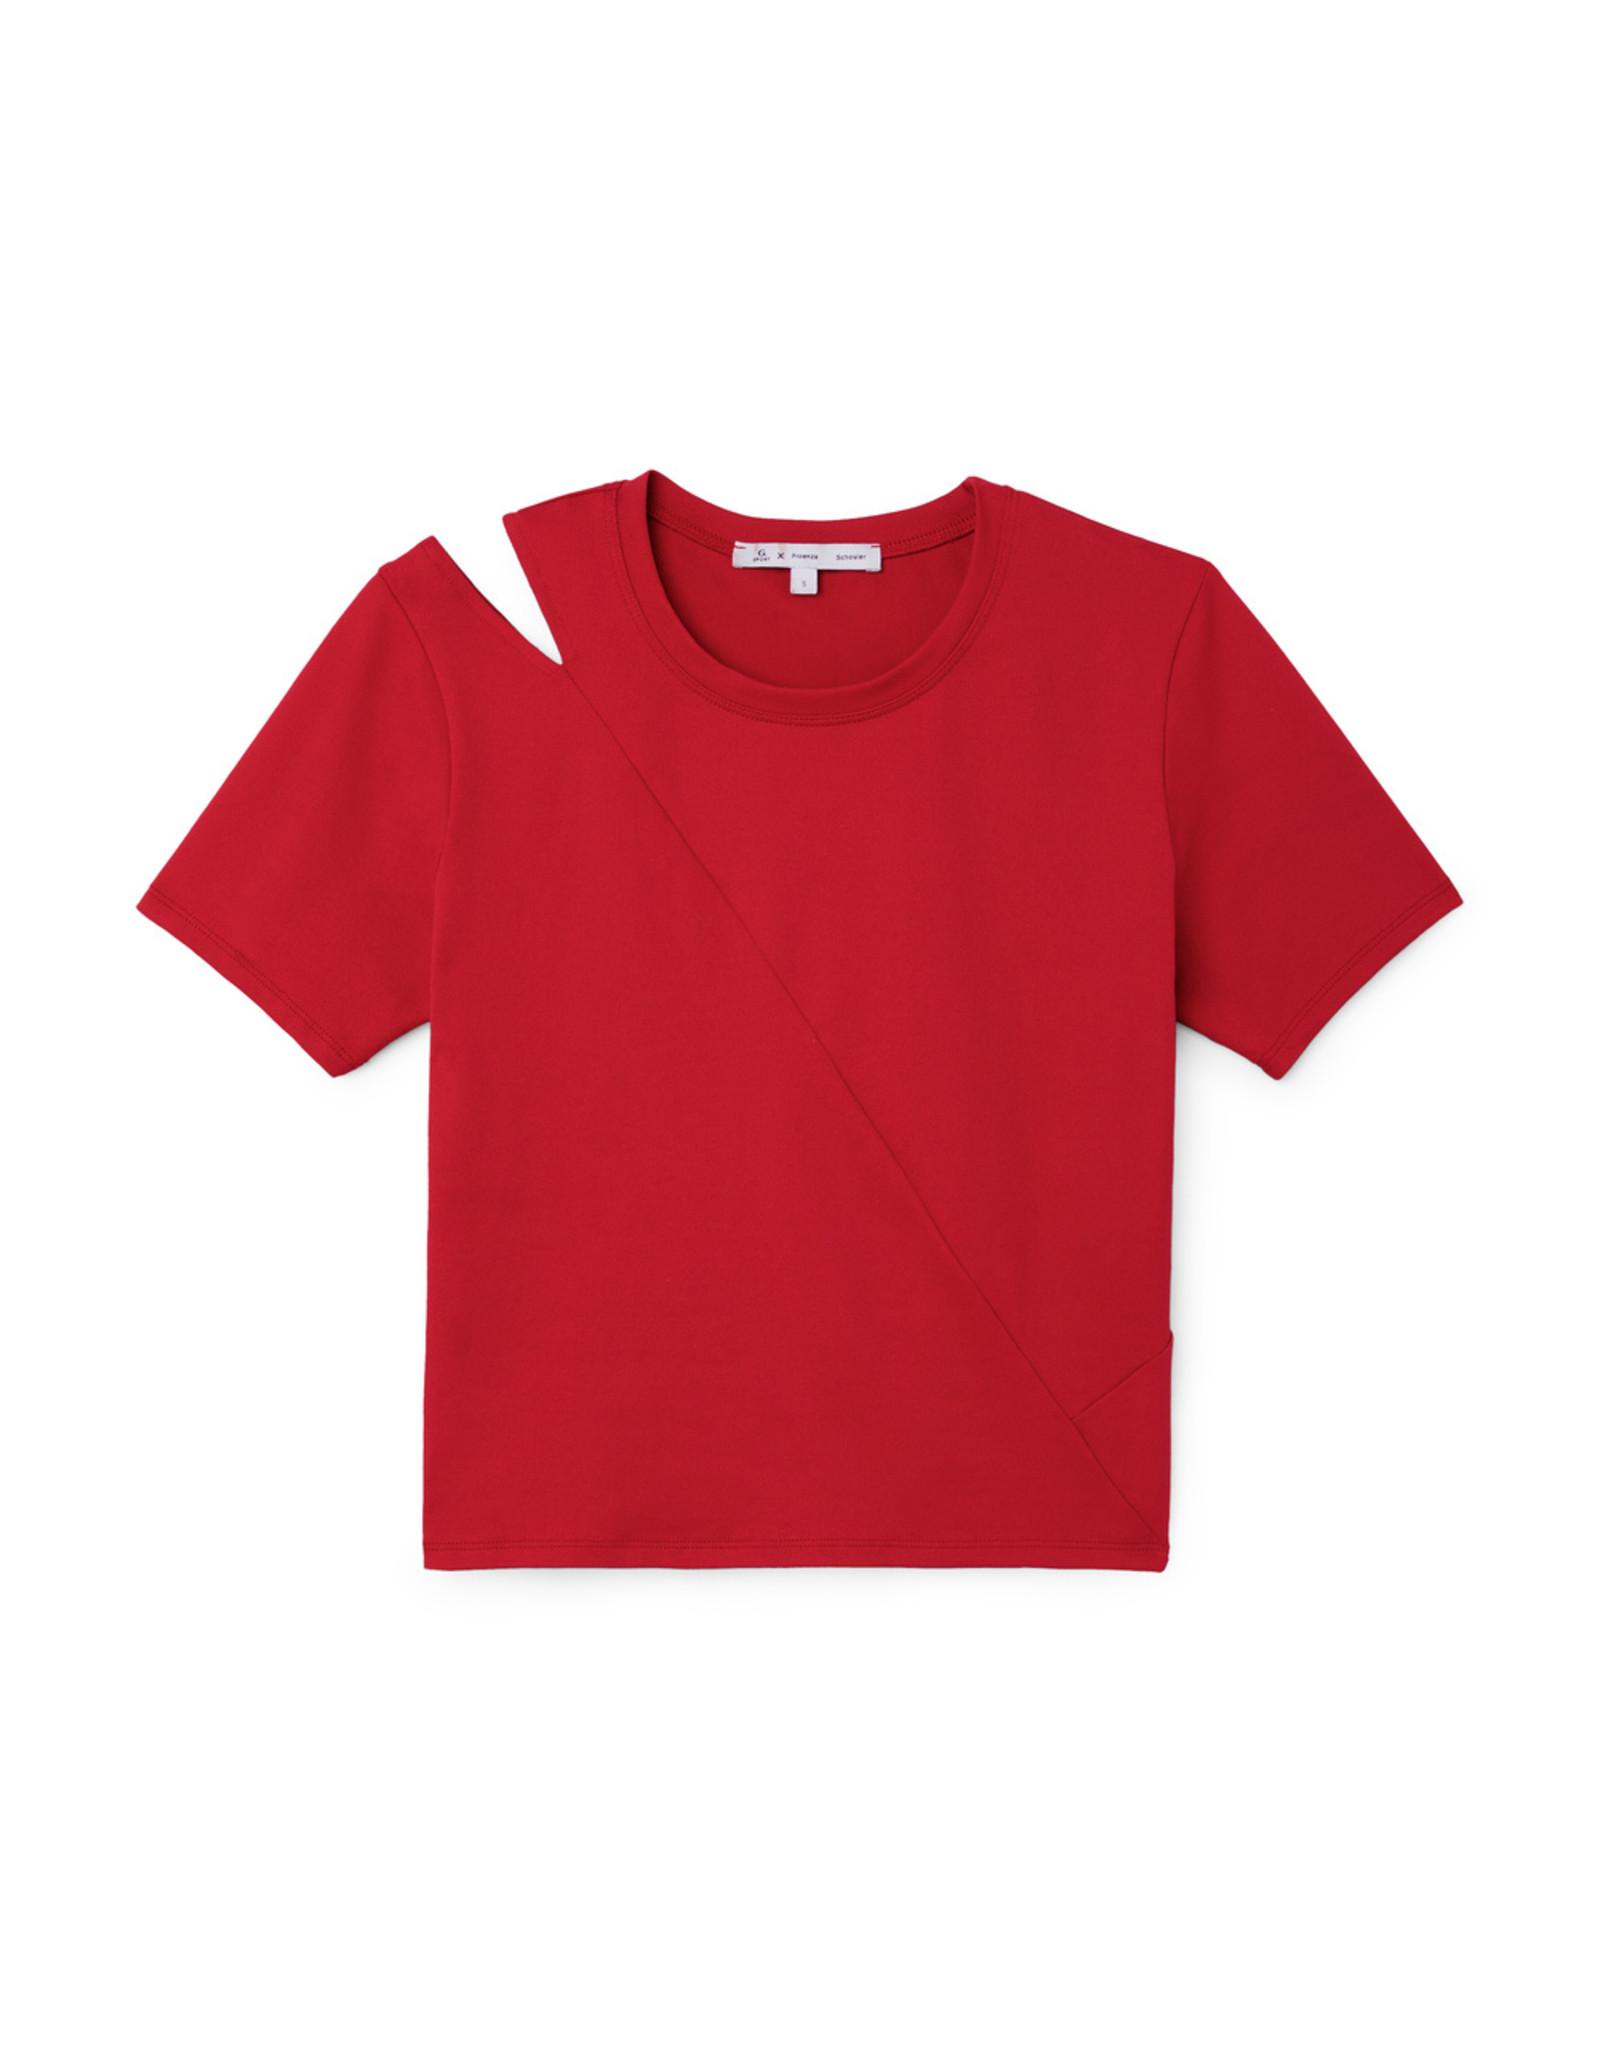 G. Sport x Proenza Schouler G. Sport x Proenza Schouler Short-Sleeve Cutout Top (Color: Red, Size: M)